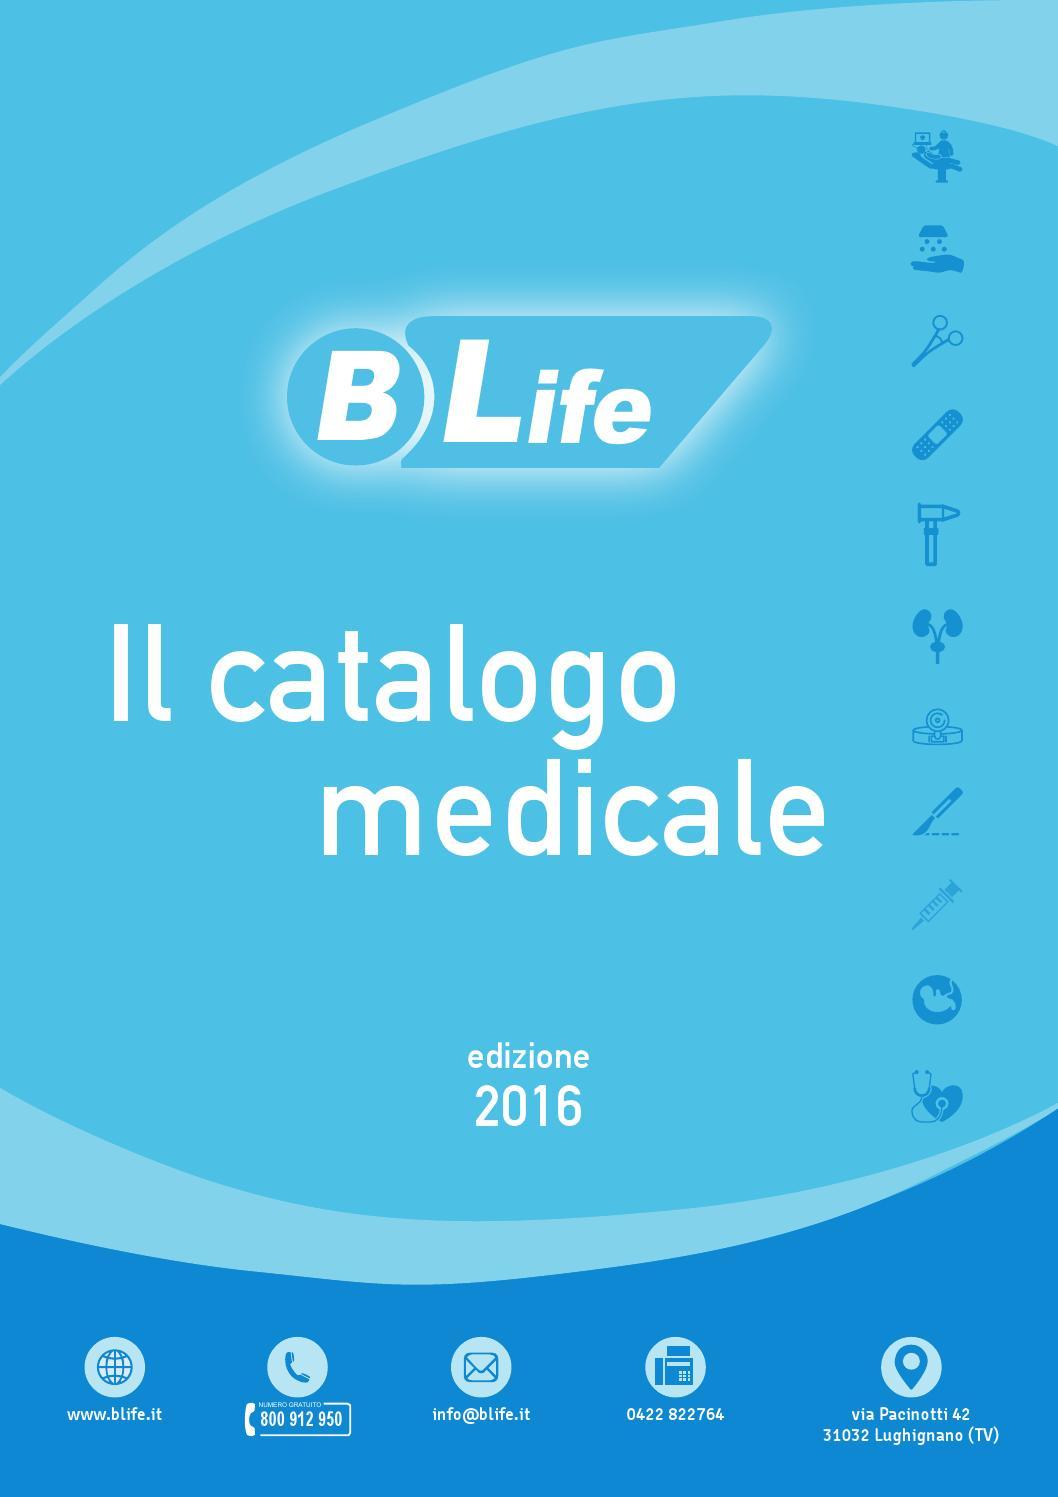 Catalogo medicale 2016 B Life by B Life Il catalogo medicale - issuu 3e74a2dce693